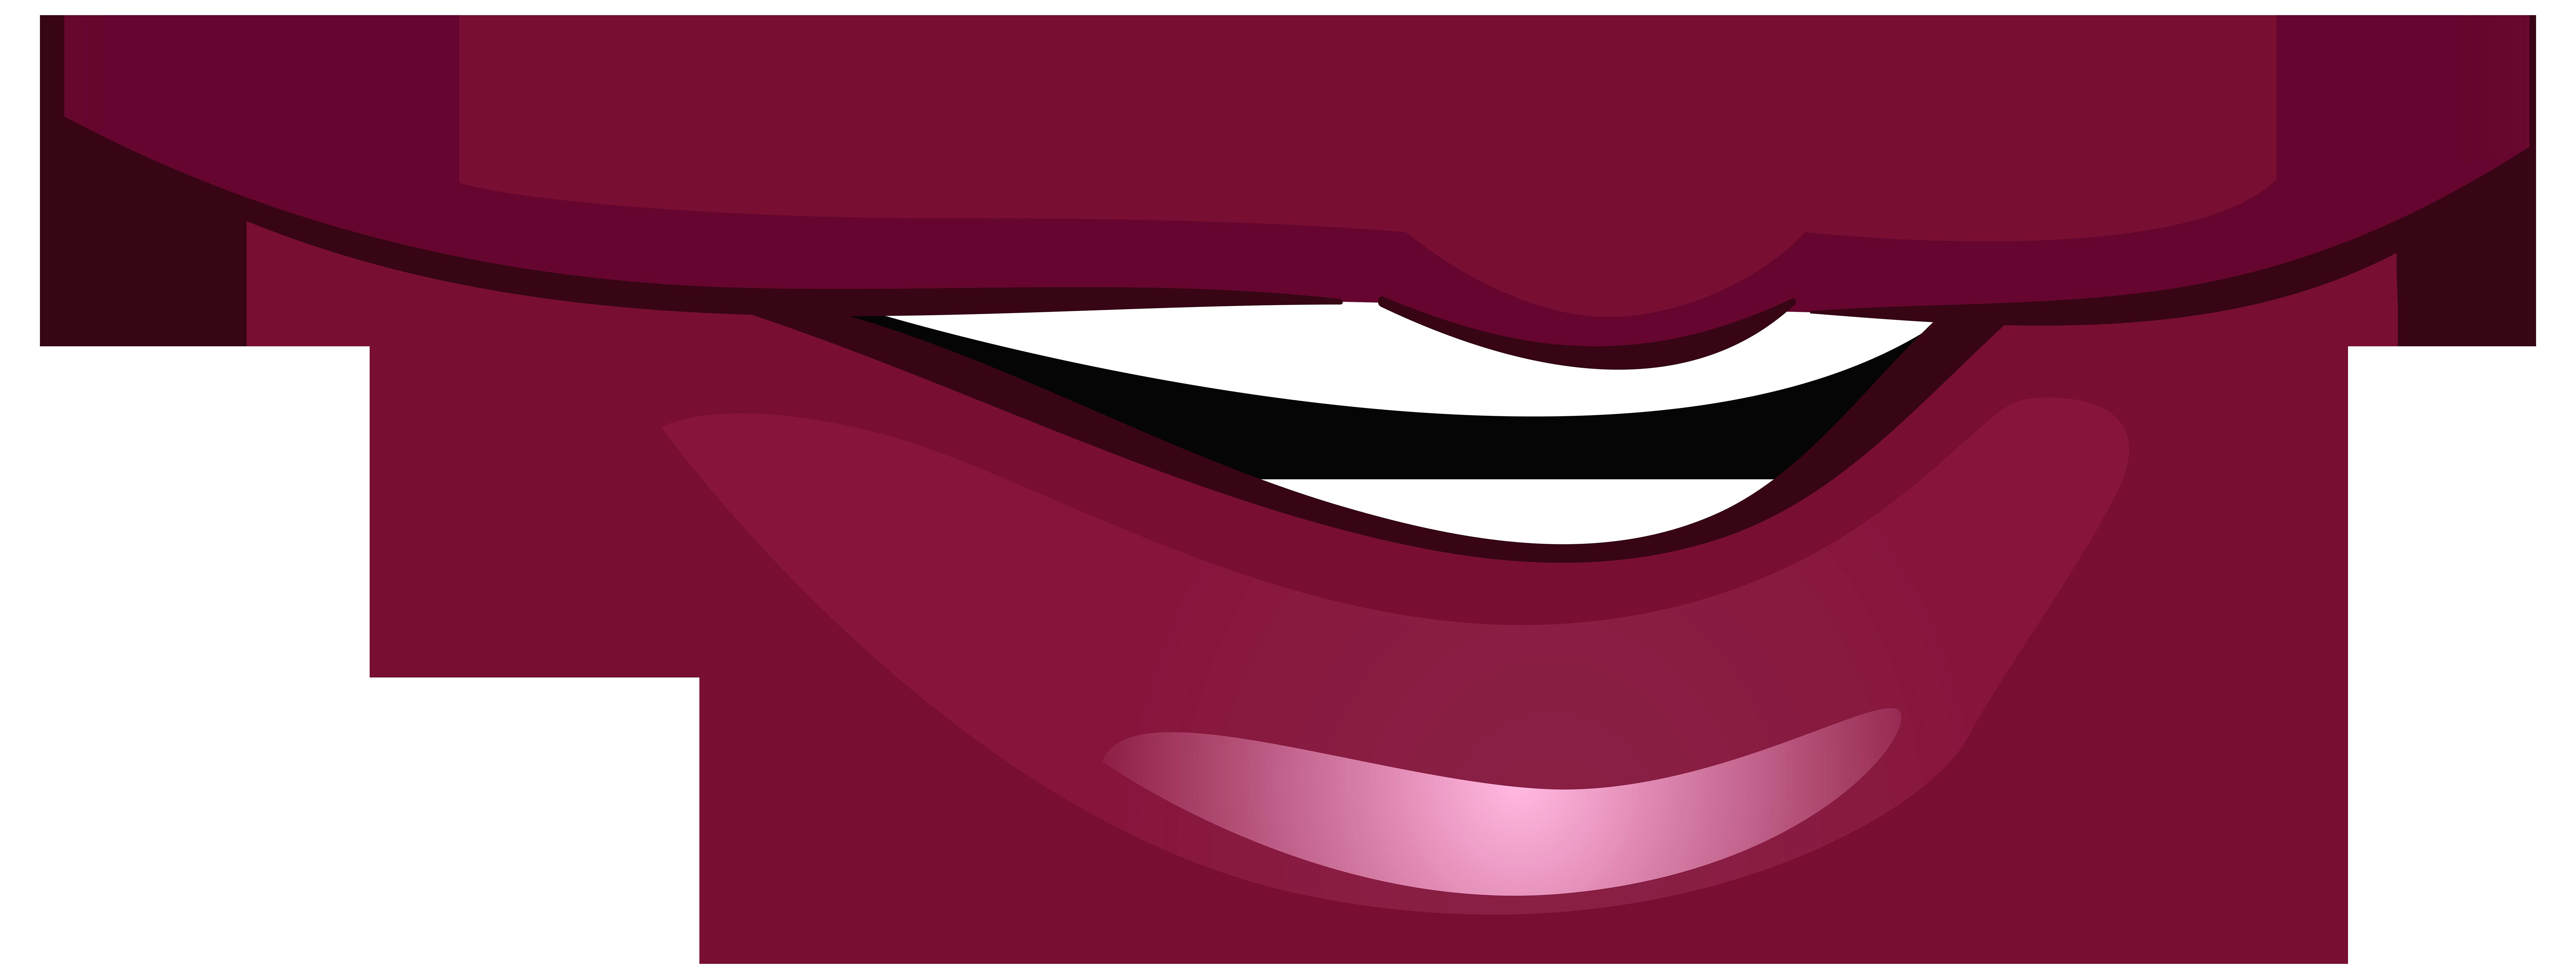 8000x3039 Maroon Clipart Lips